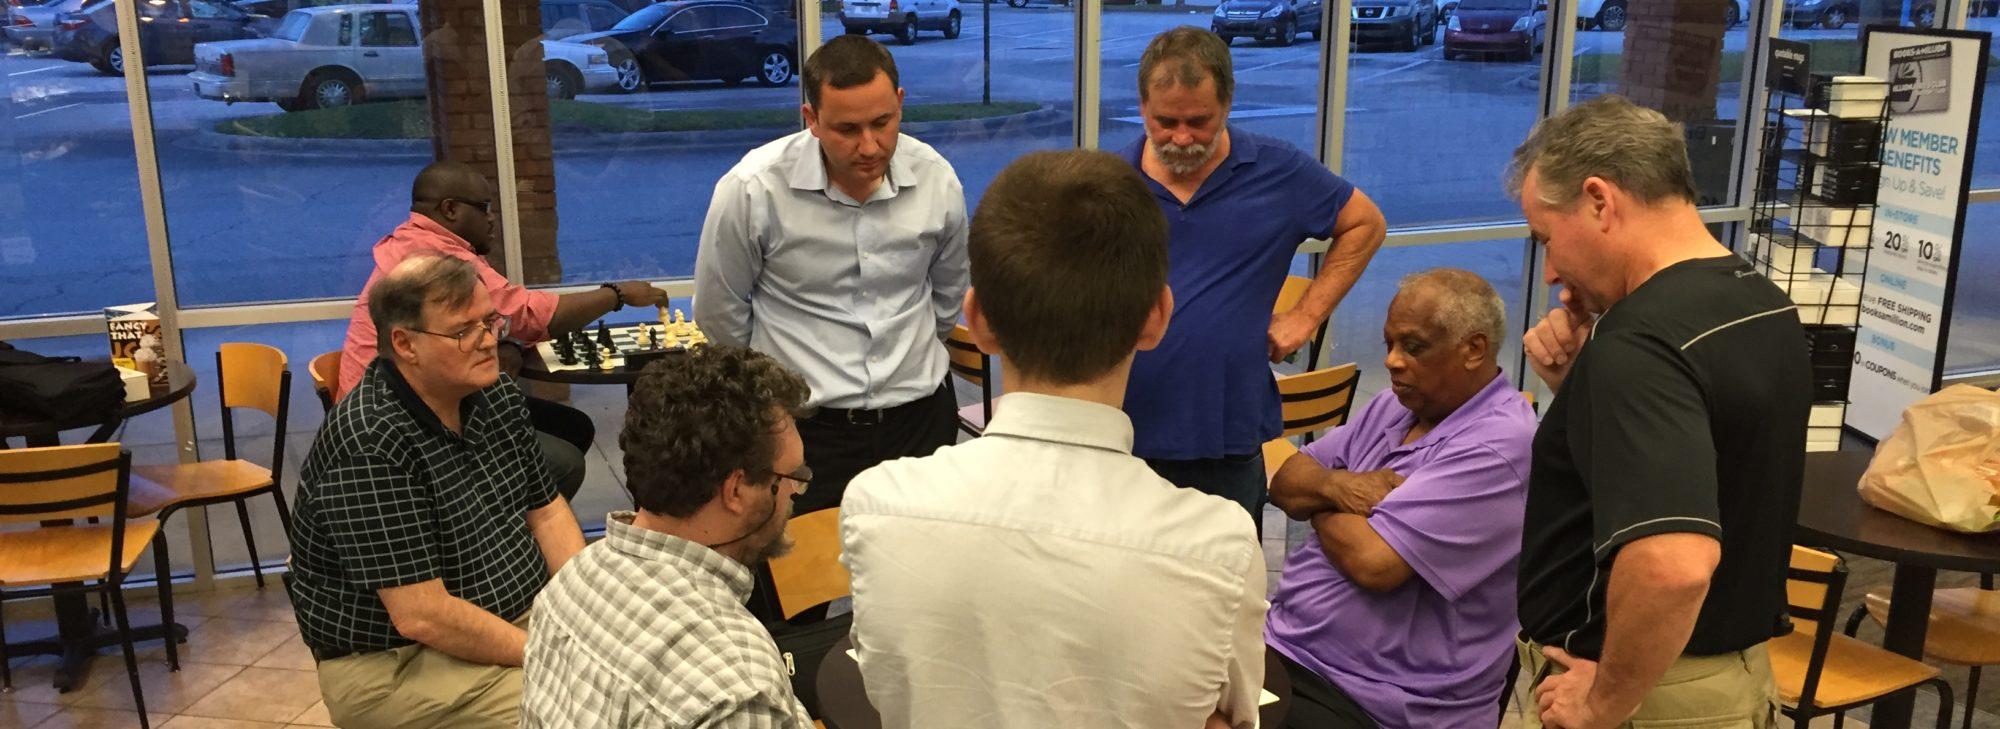 JAXCC – Jacksonville Chess Club (FL), INC